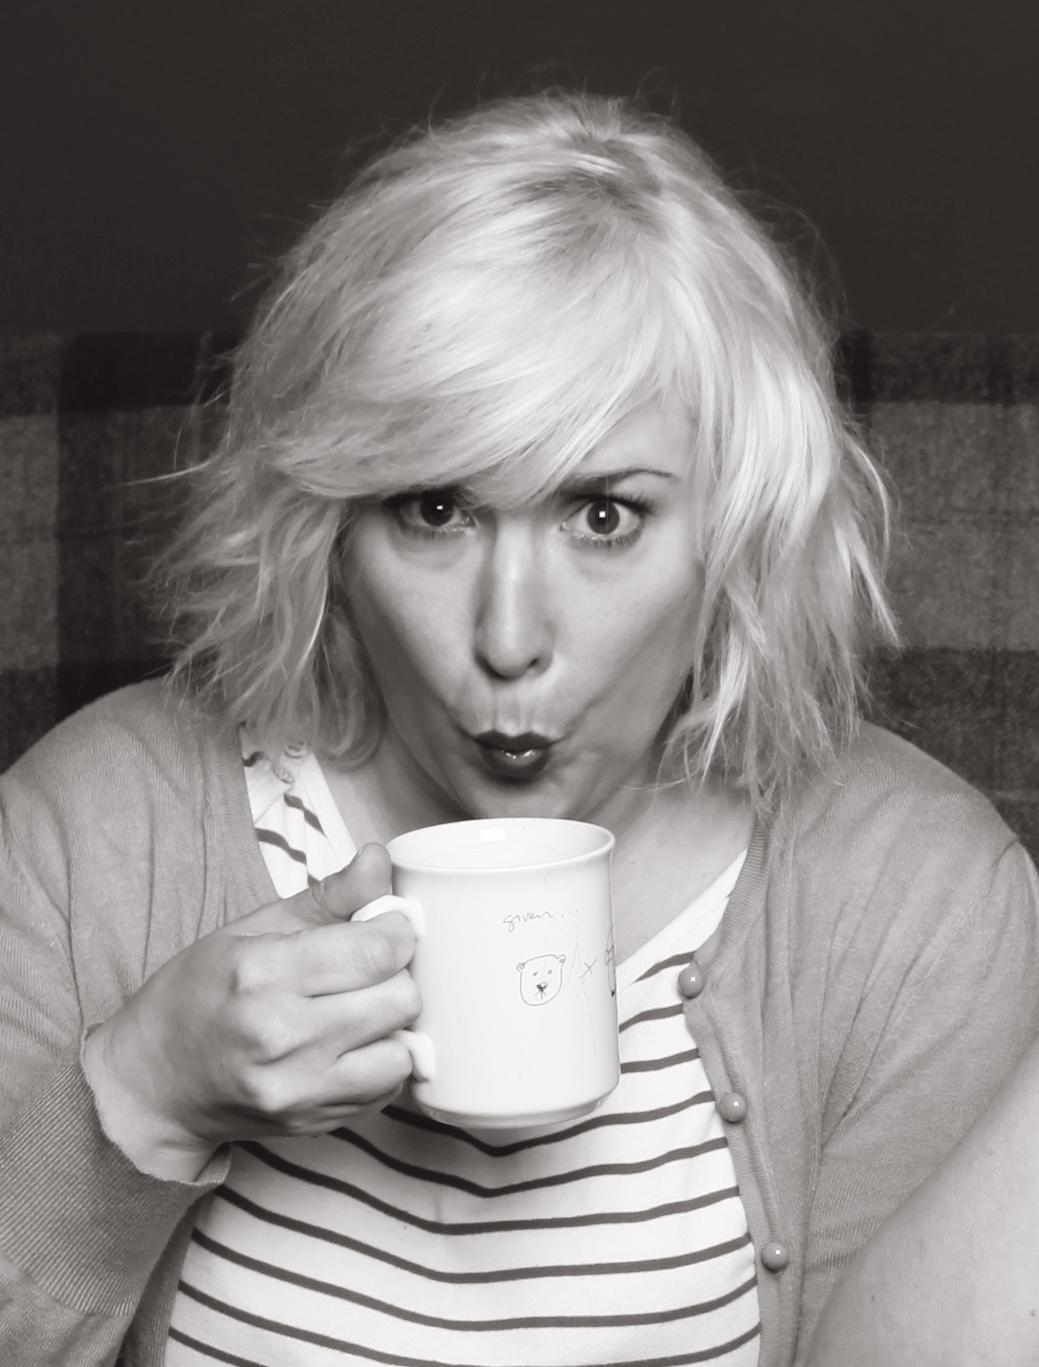 Me drinking tea